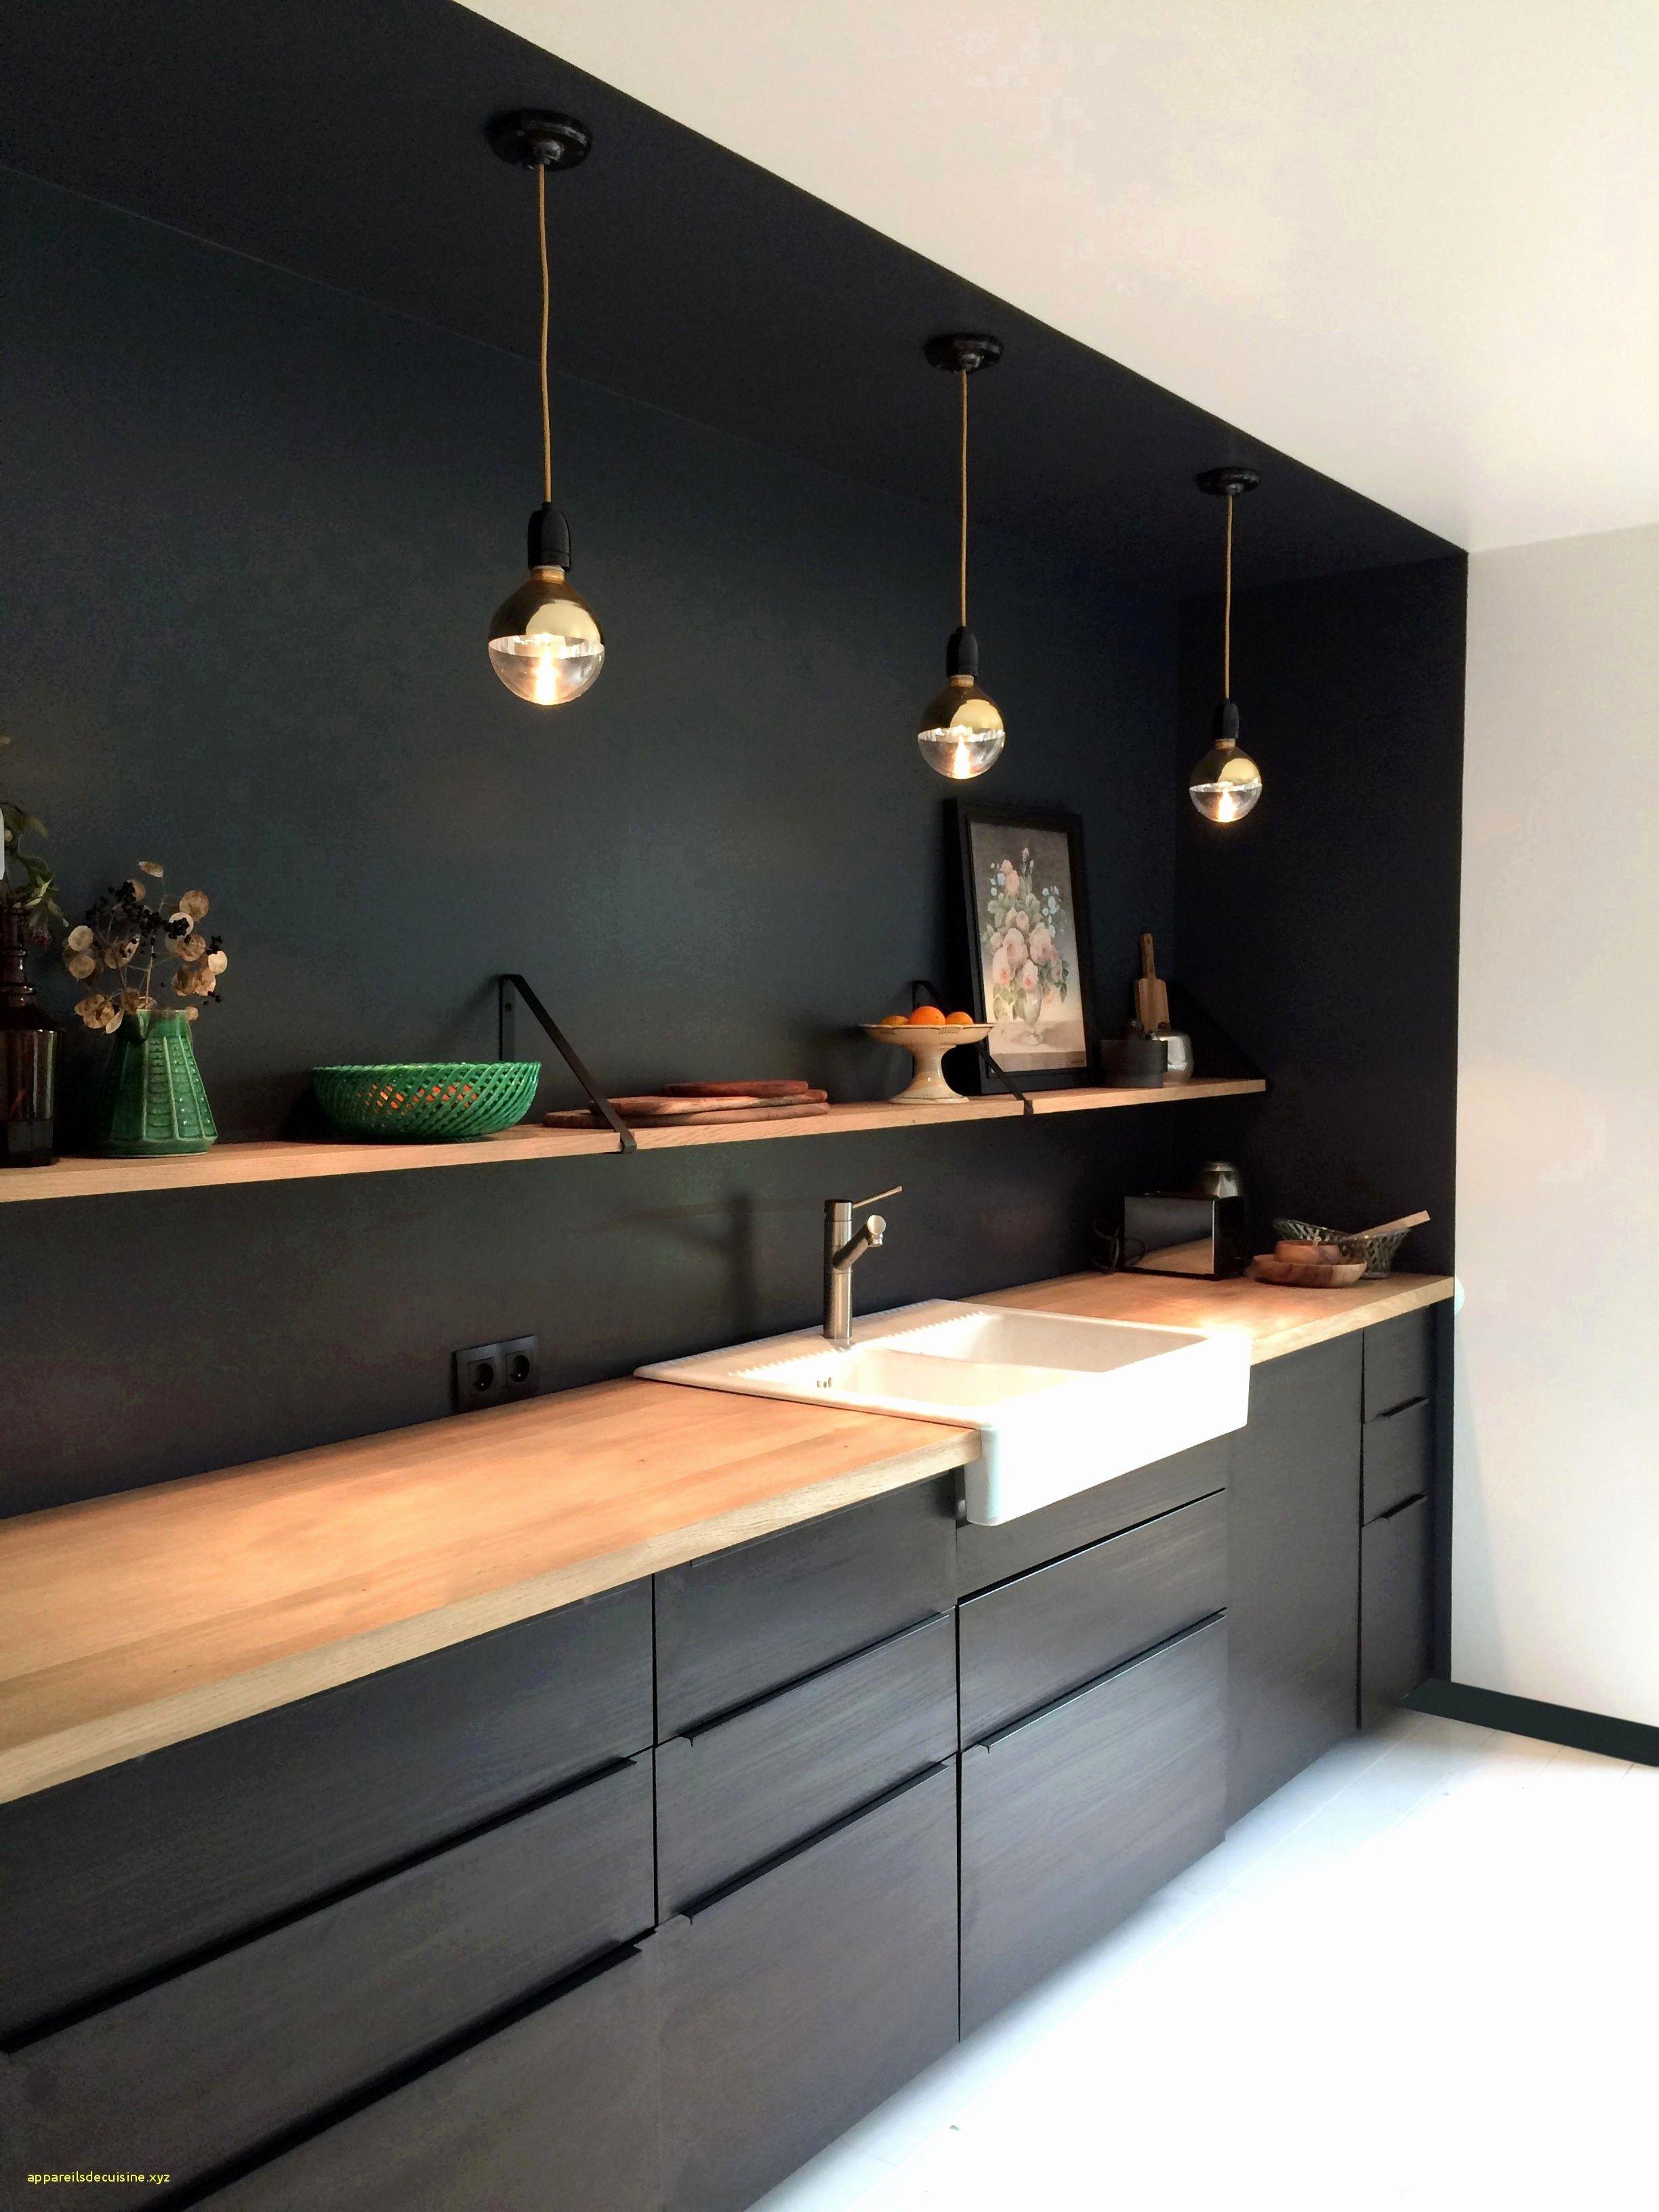 Beautiful Plan Travail Cuisine Leroy Merlin Ikea Kitchen Design Modern Kitchen Interiors Cheap Kitchen Remodel